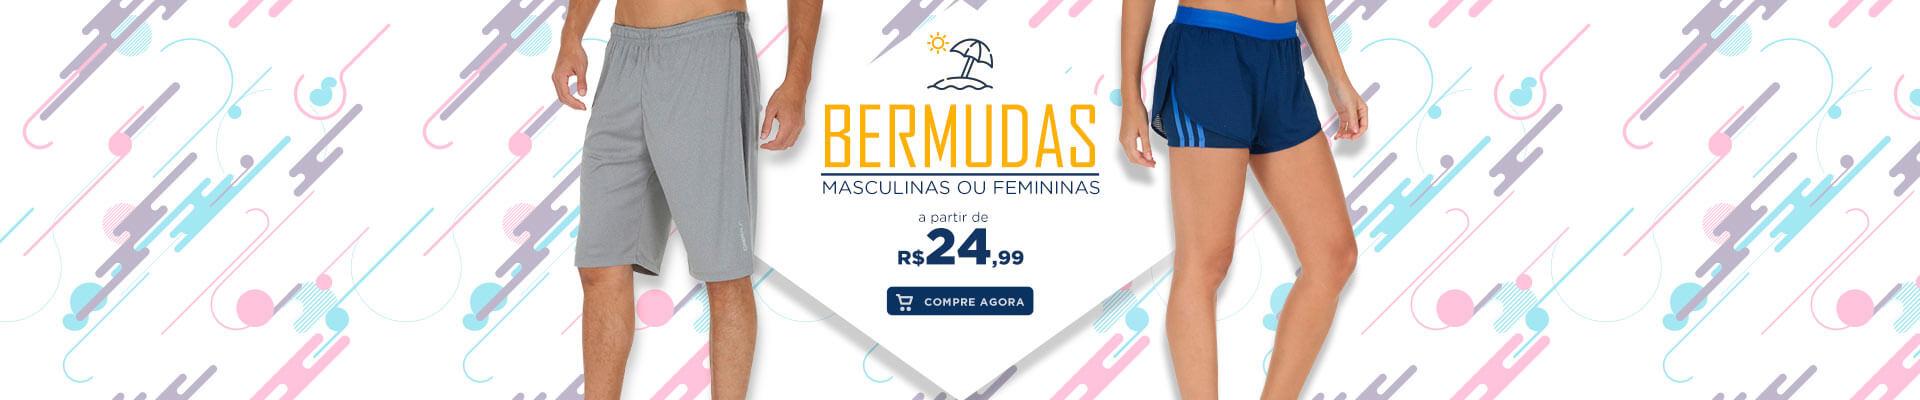 Bermudas Masculina e Feminina